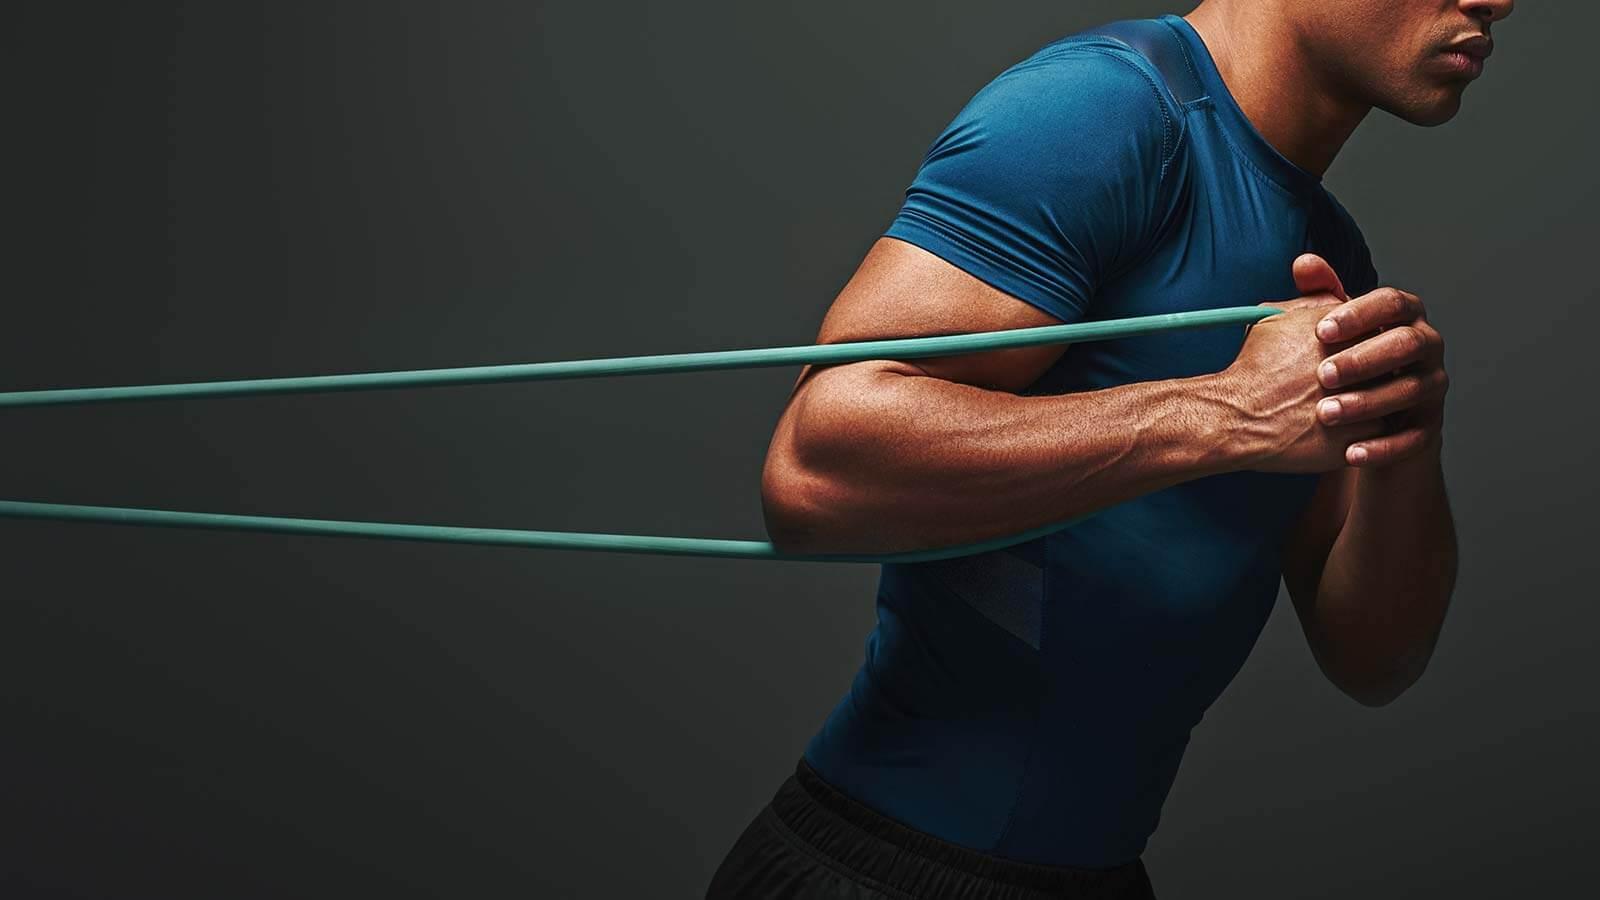 consulter avis medical avant entrainement musculation